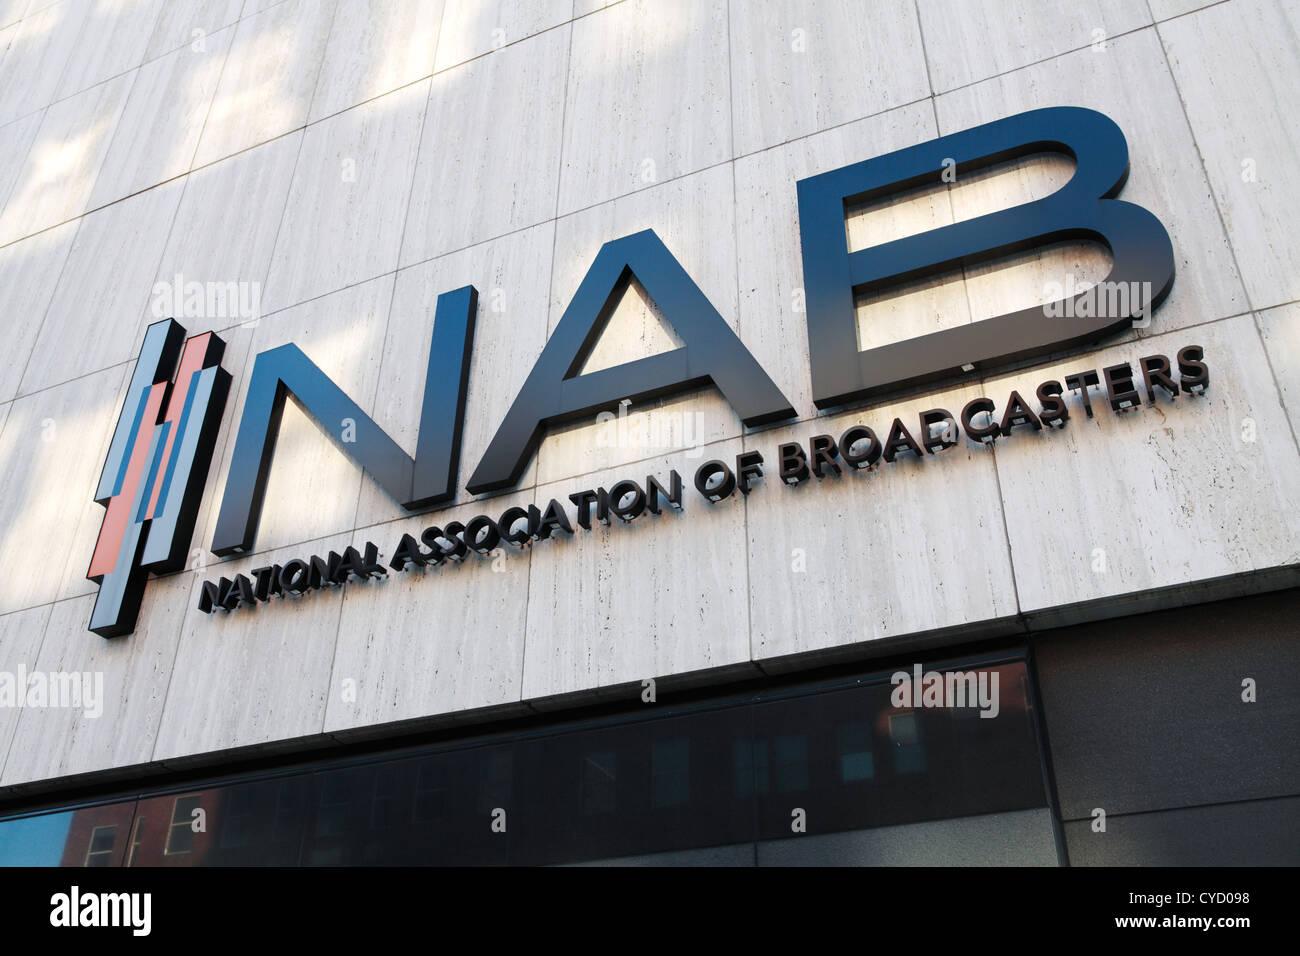 National association of broadcasters, Washington, USA Stock Photo